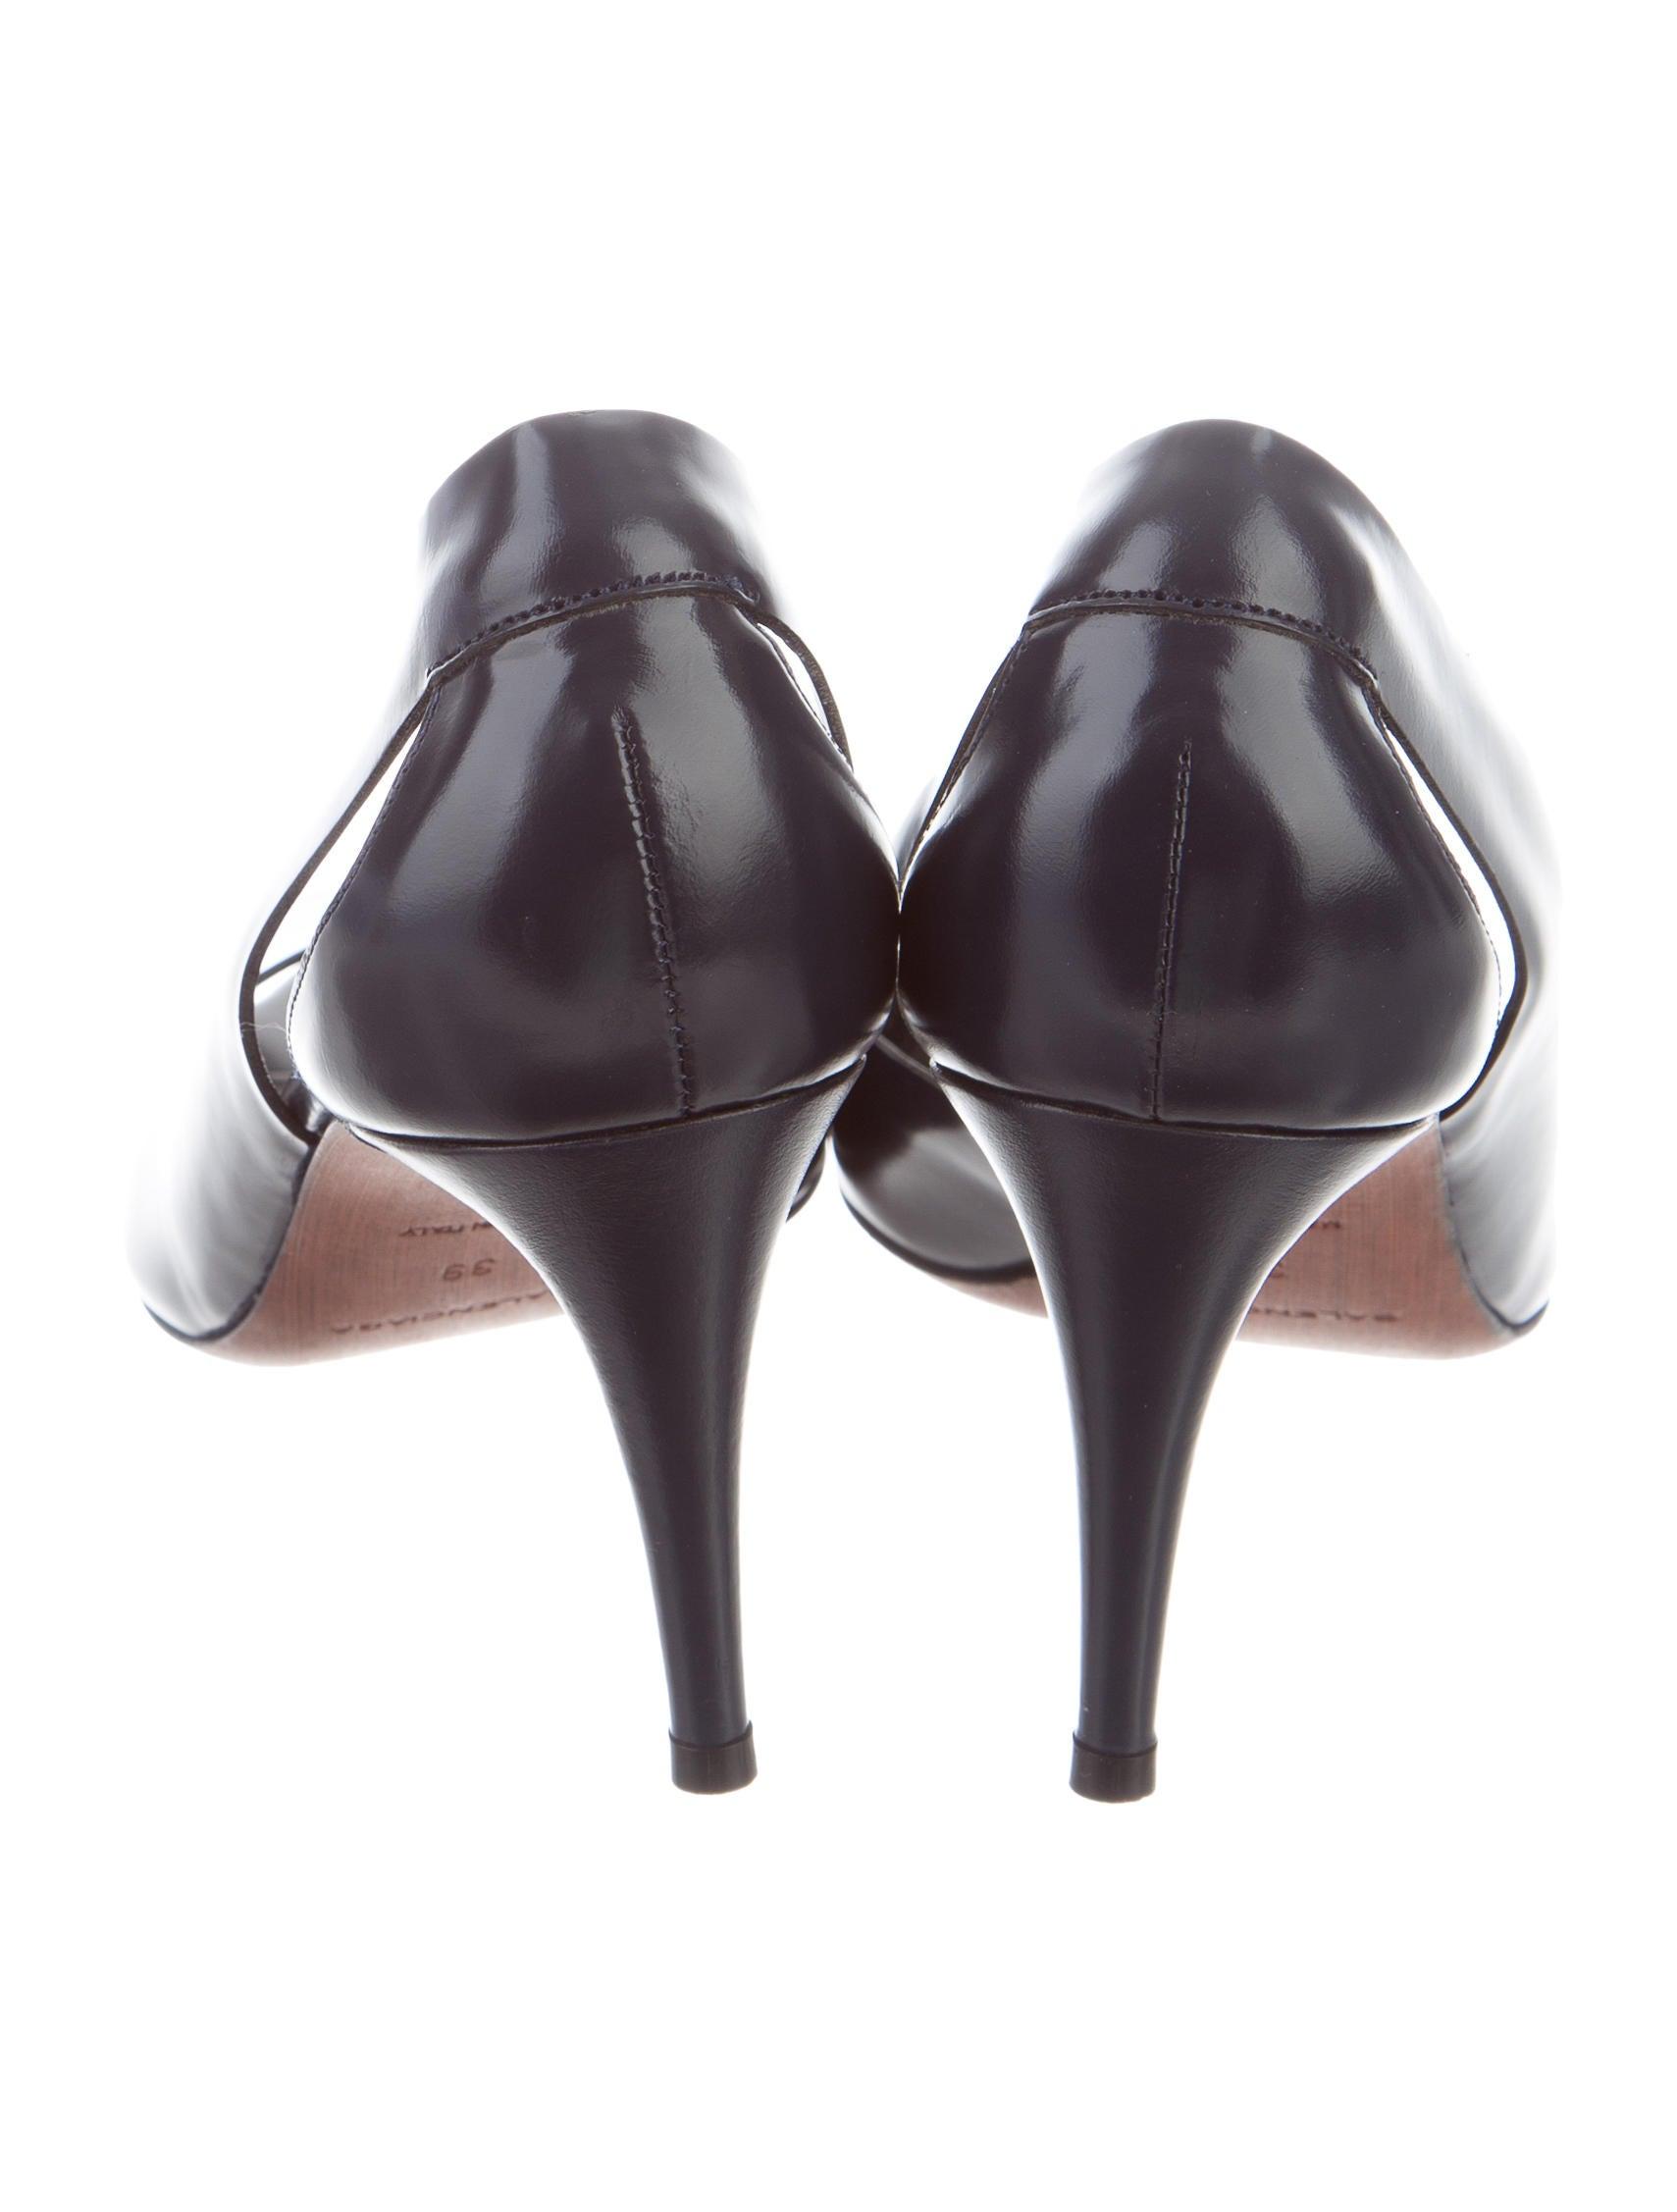 Balenciaga Peep-Toe Half d'Orsay Pumps outlet pick a best cheap sale comfortable 9Fq7rpYkh